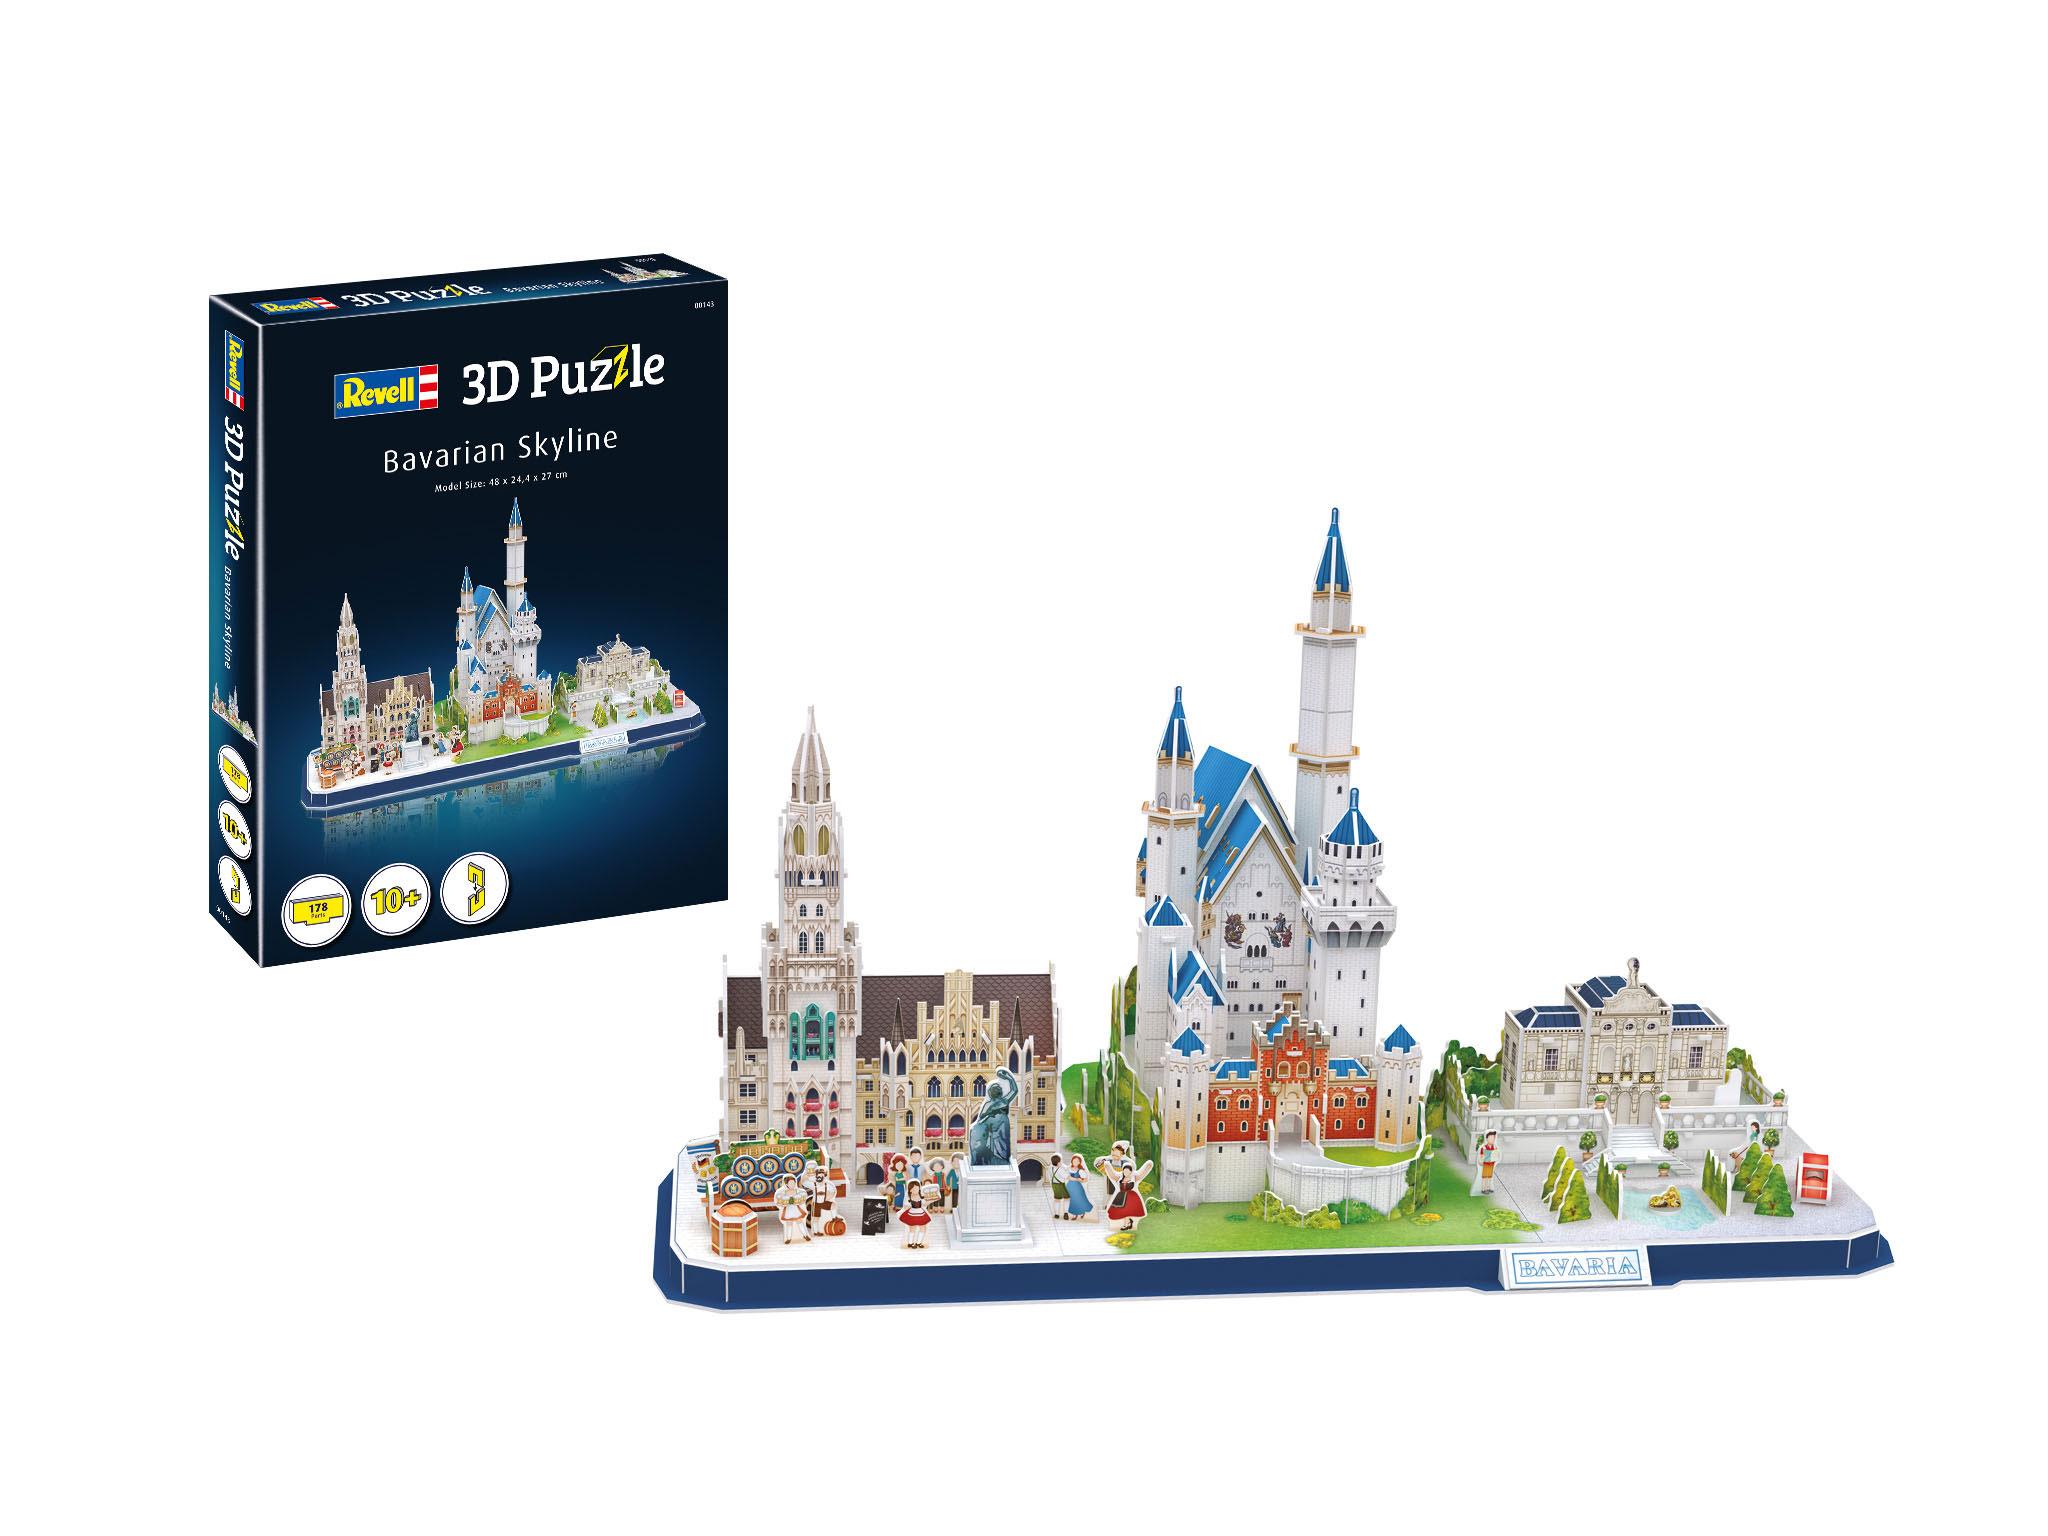 Revell 3D Puzzle - Bavarian Skyline 00143